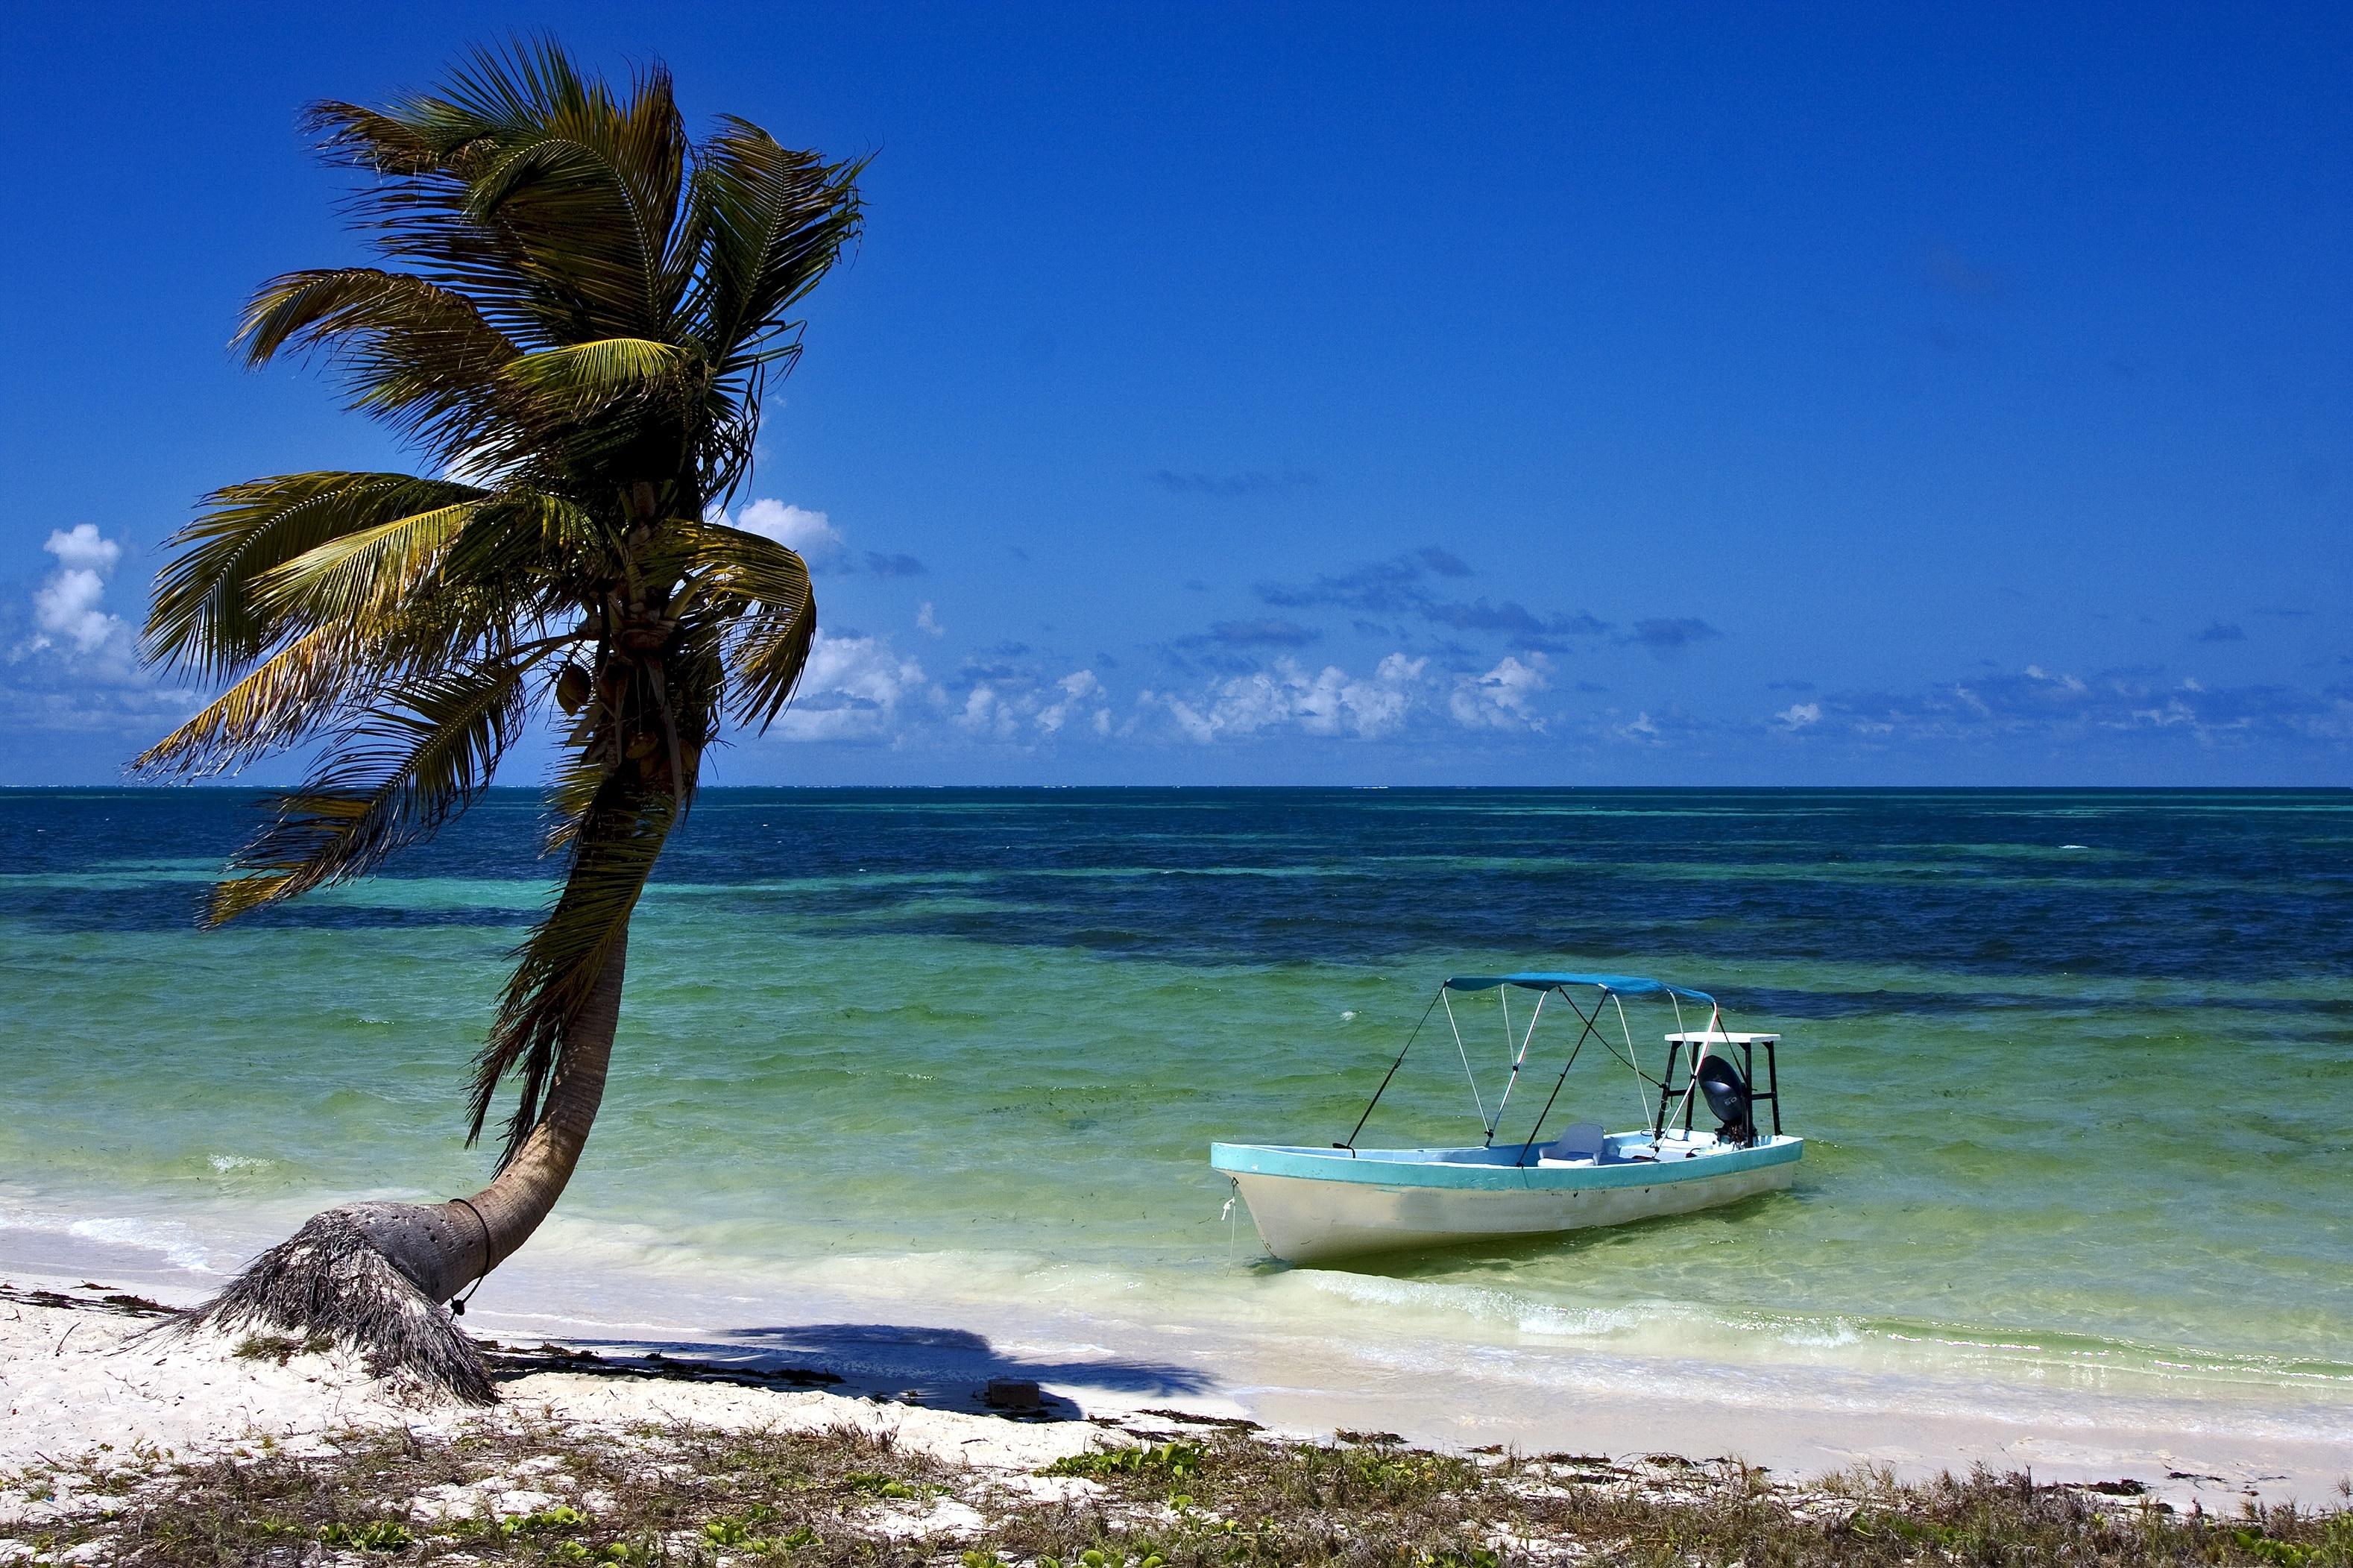 Sian Ka'an Biosphere Reserve, Felipe Carrillo Puerto, Quintana Roo, Mexico